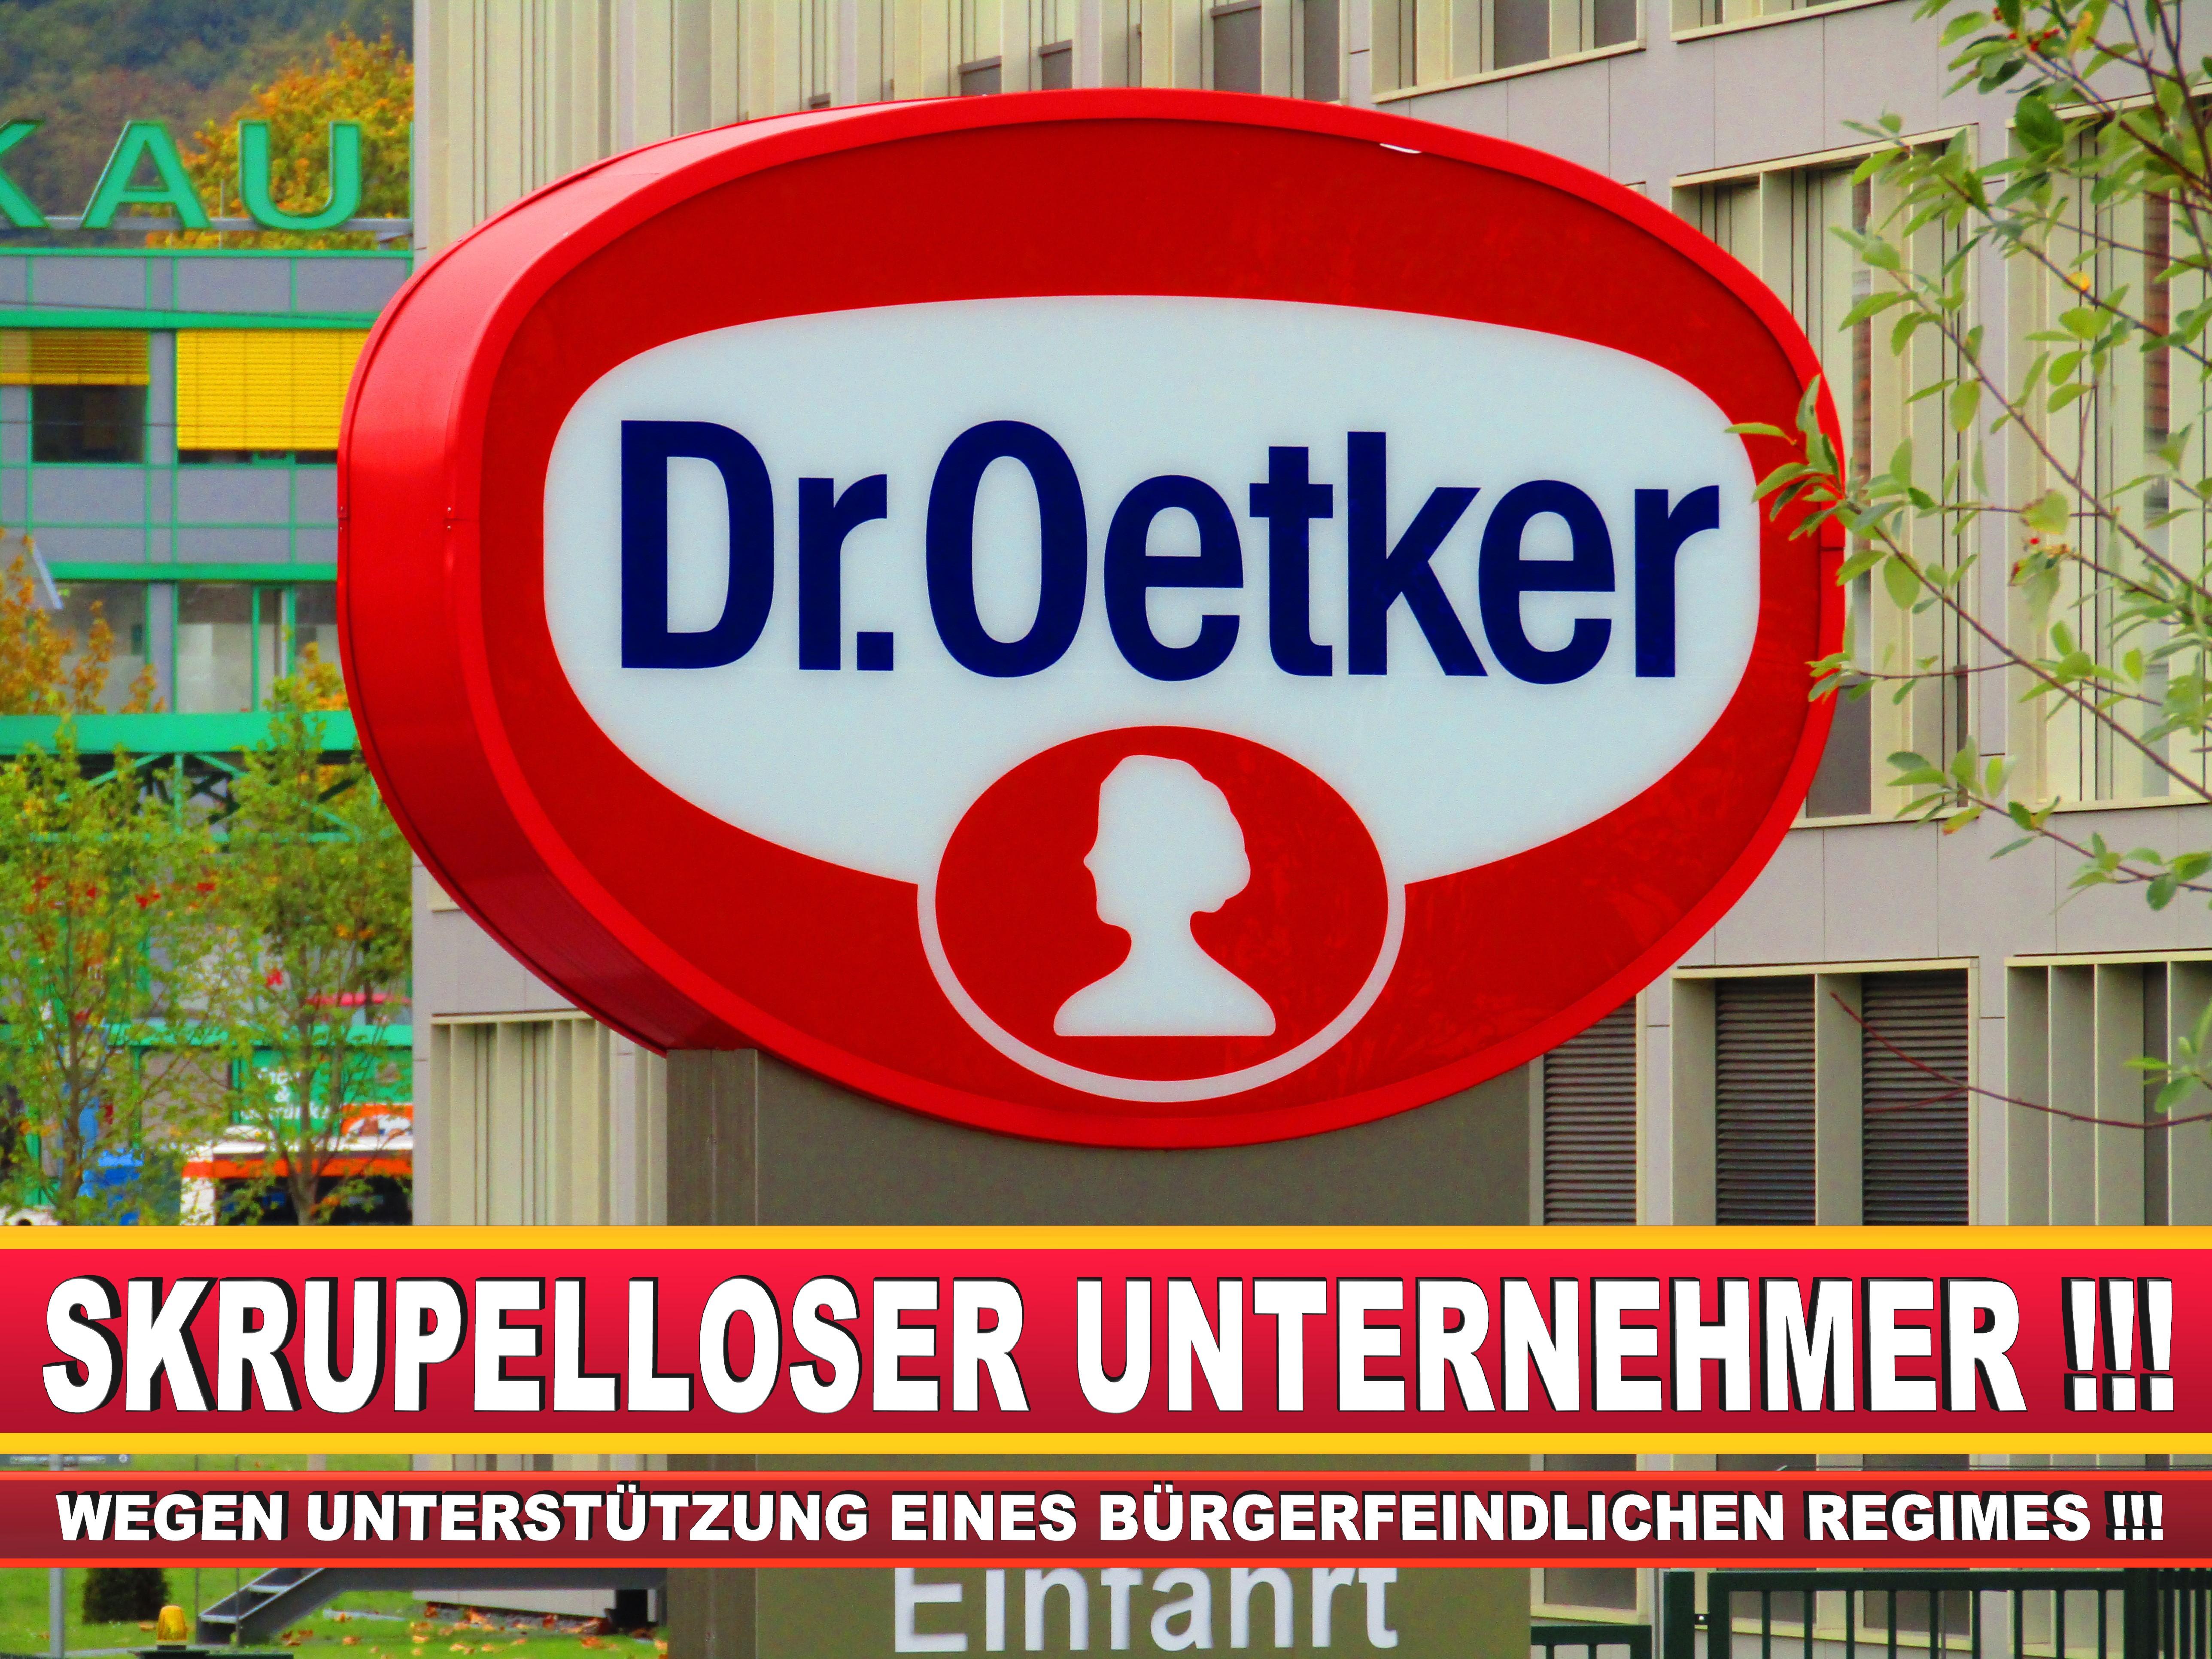 Dr Oetker Bielefeld CDU Bielefeld Spendengelder Skandal Richard August (34)